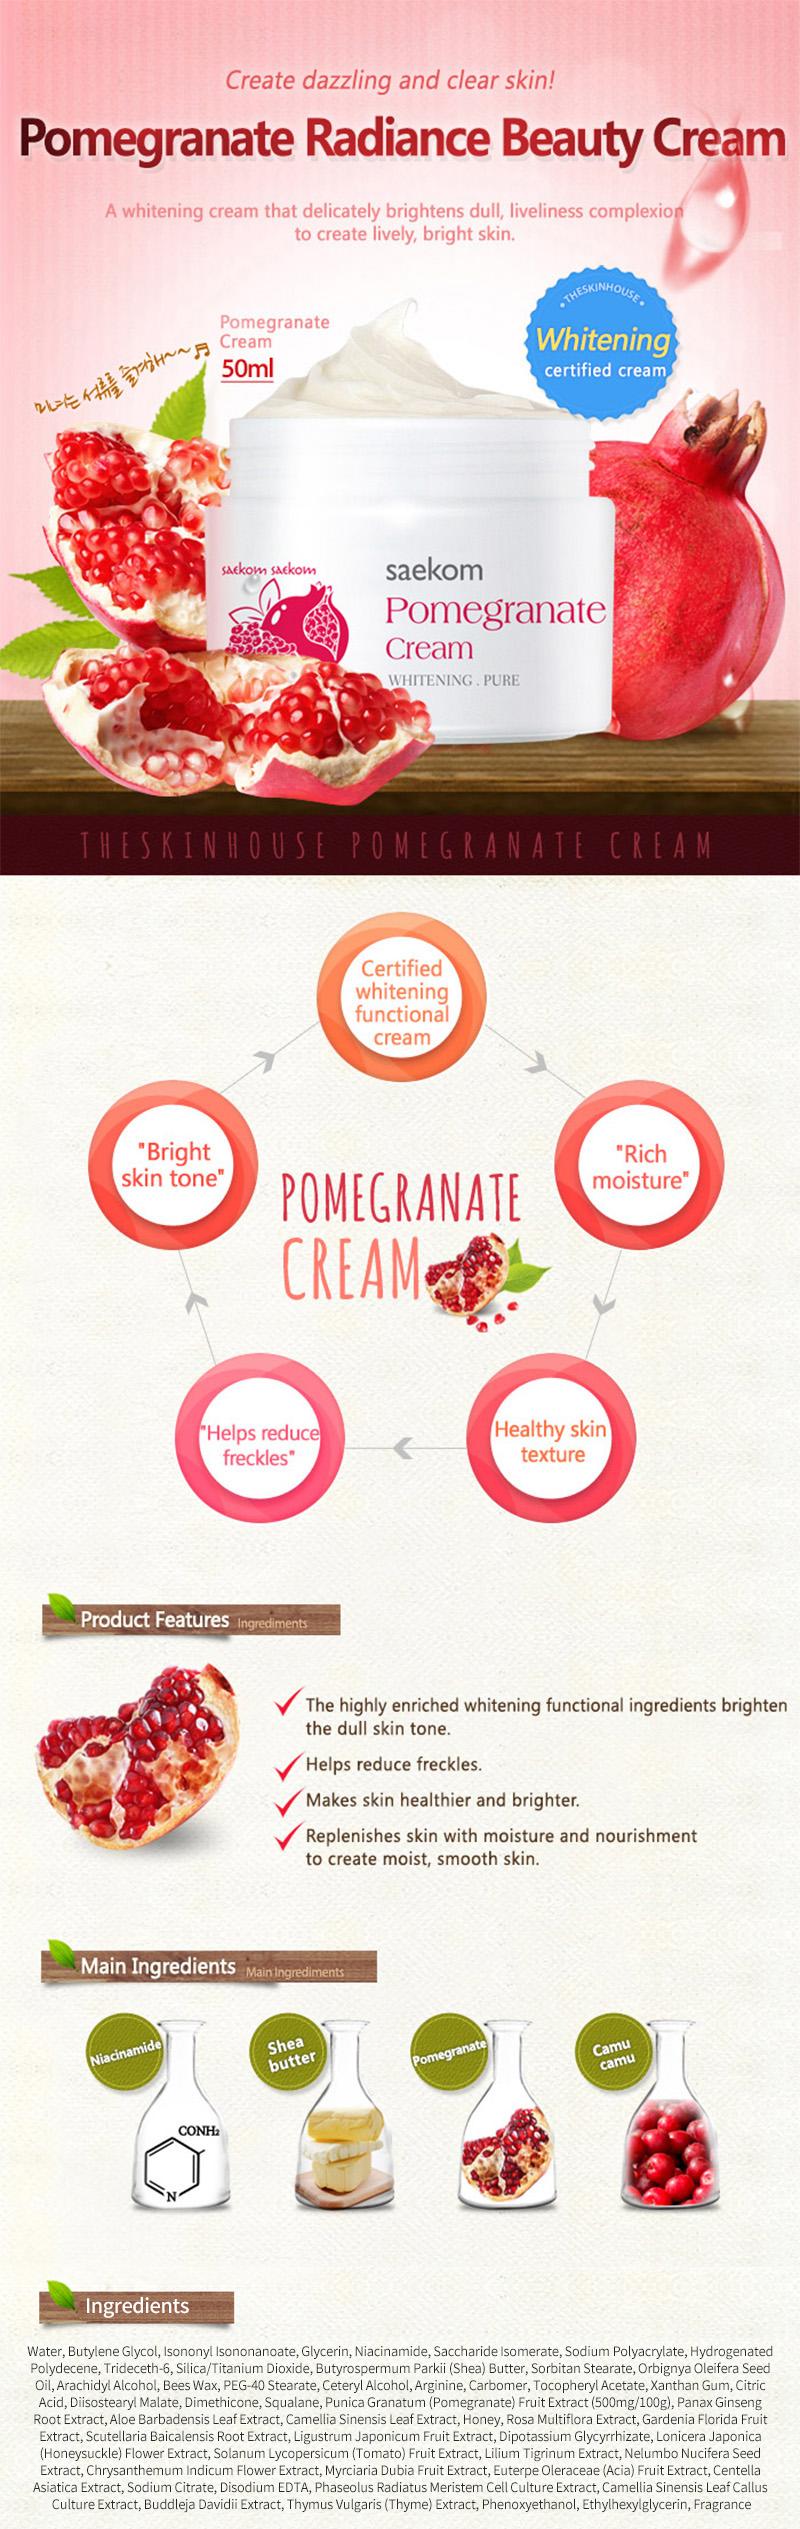 0525_PomegranateRadianceCream